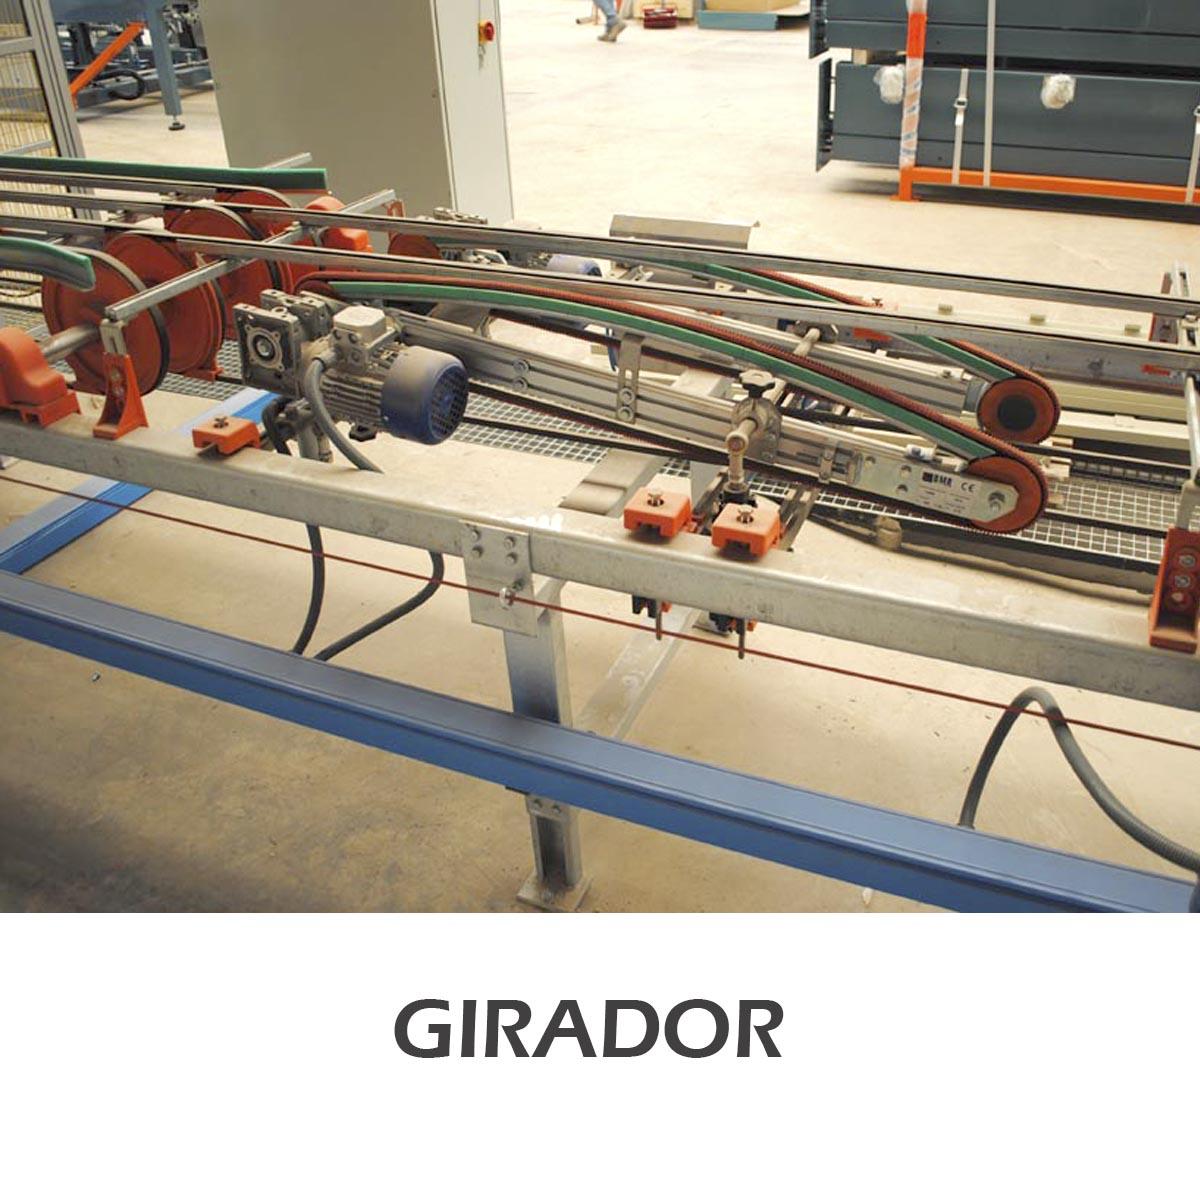 lineas-transporte-girador-maquinaria-industrial